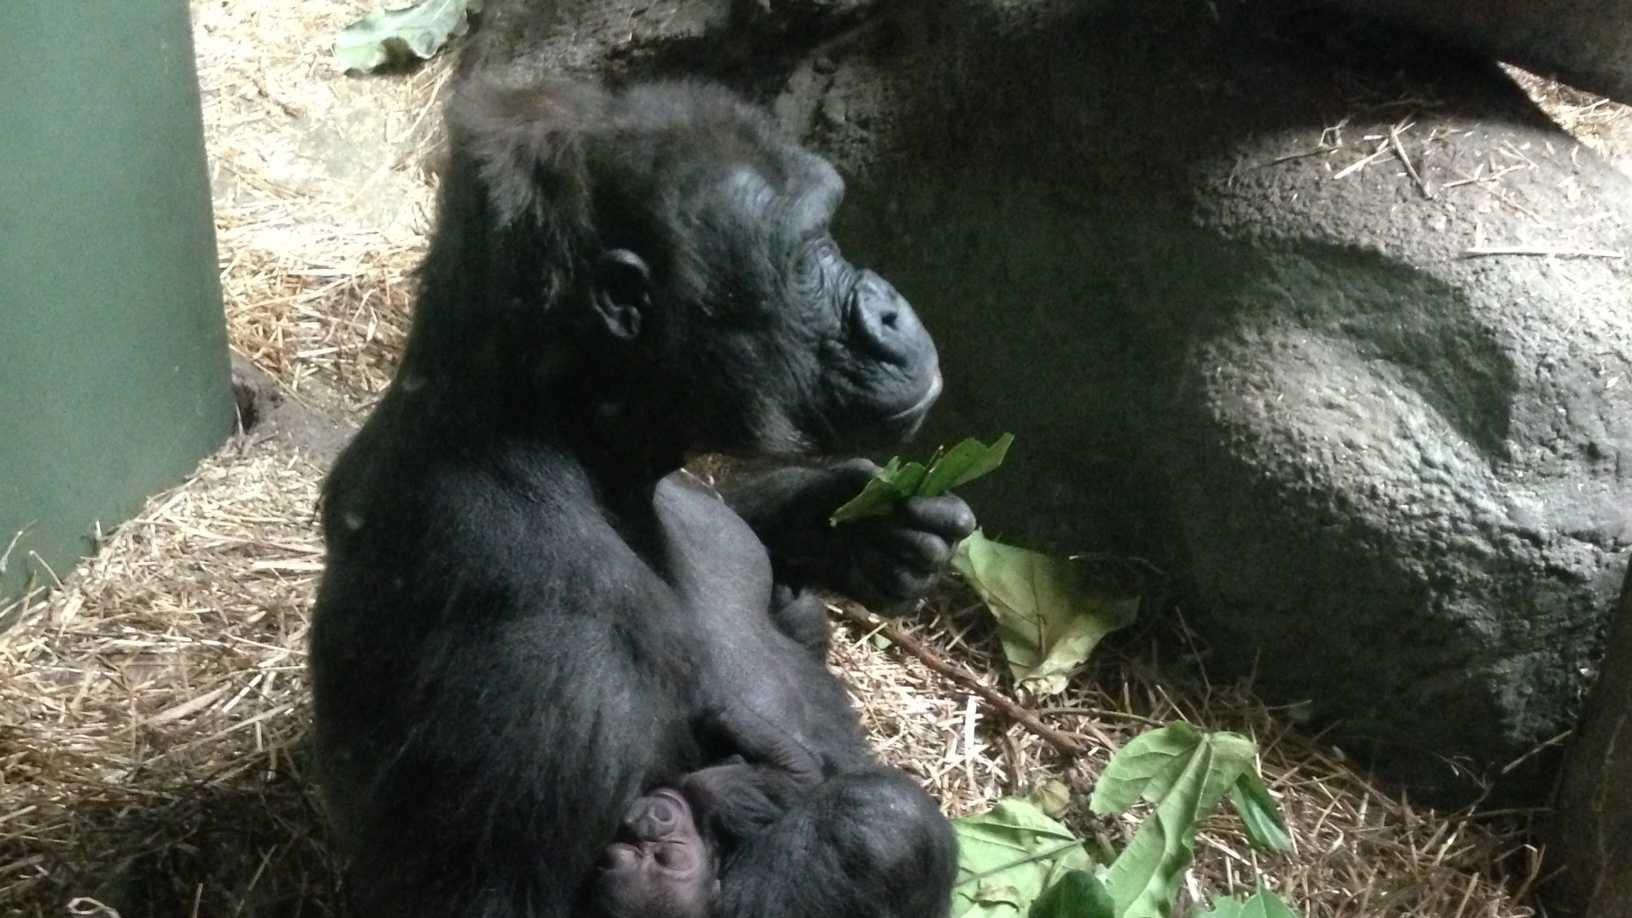 Moka with baby gorilla